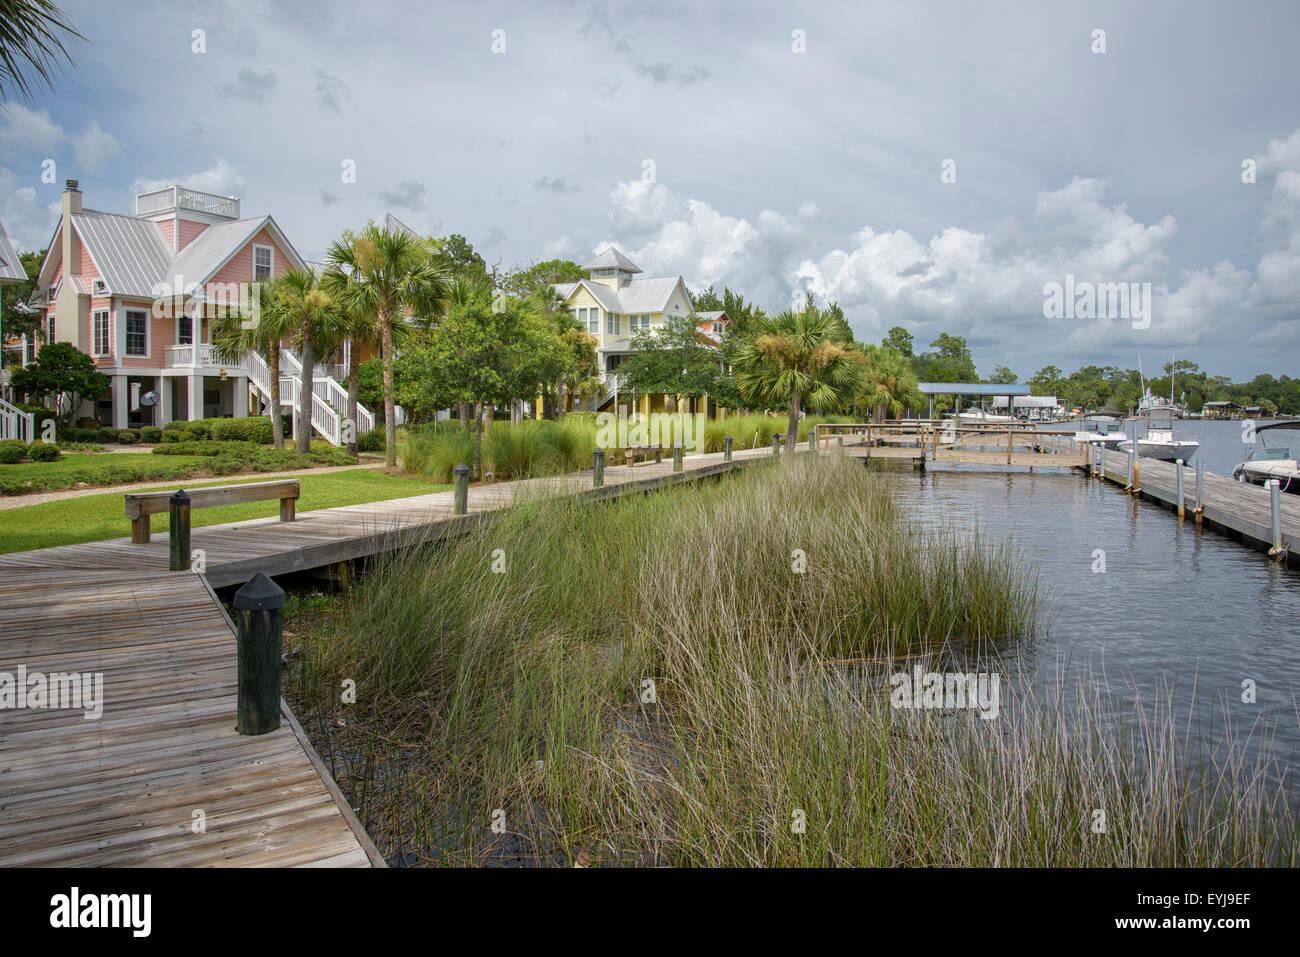 Docks on river at Steinhatchee, FL - Stock Image